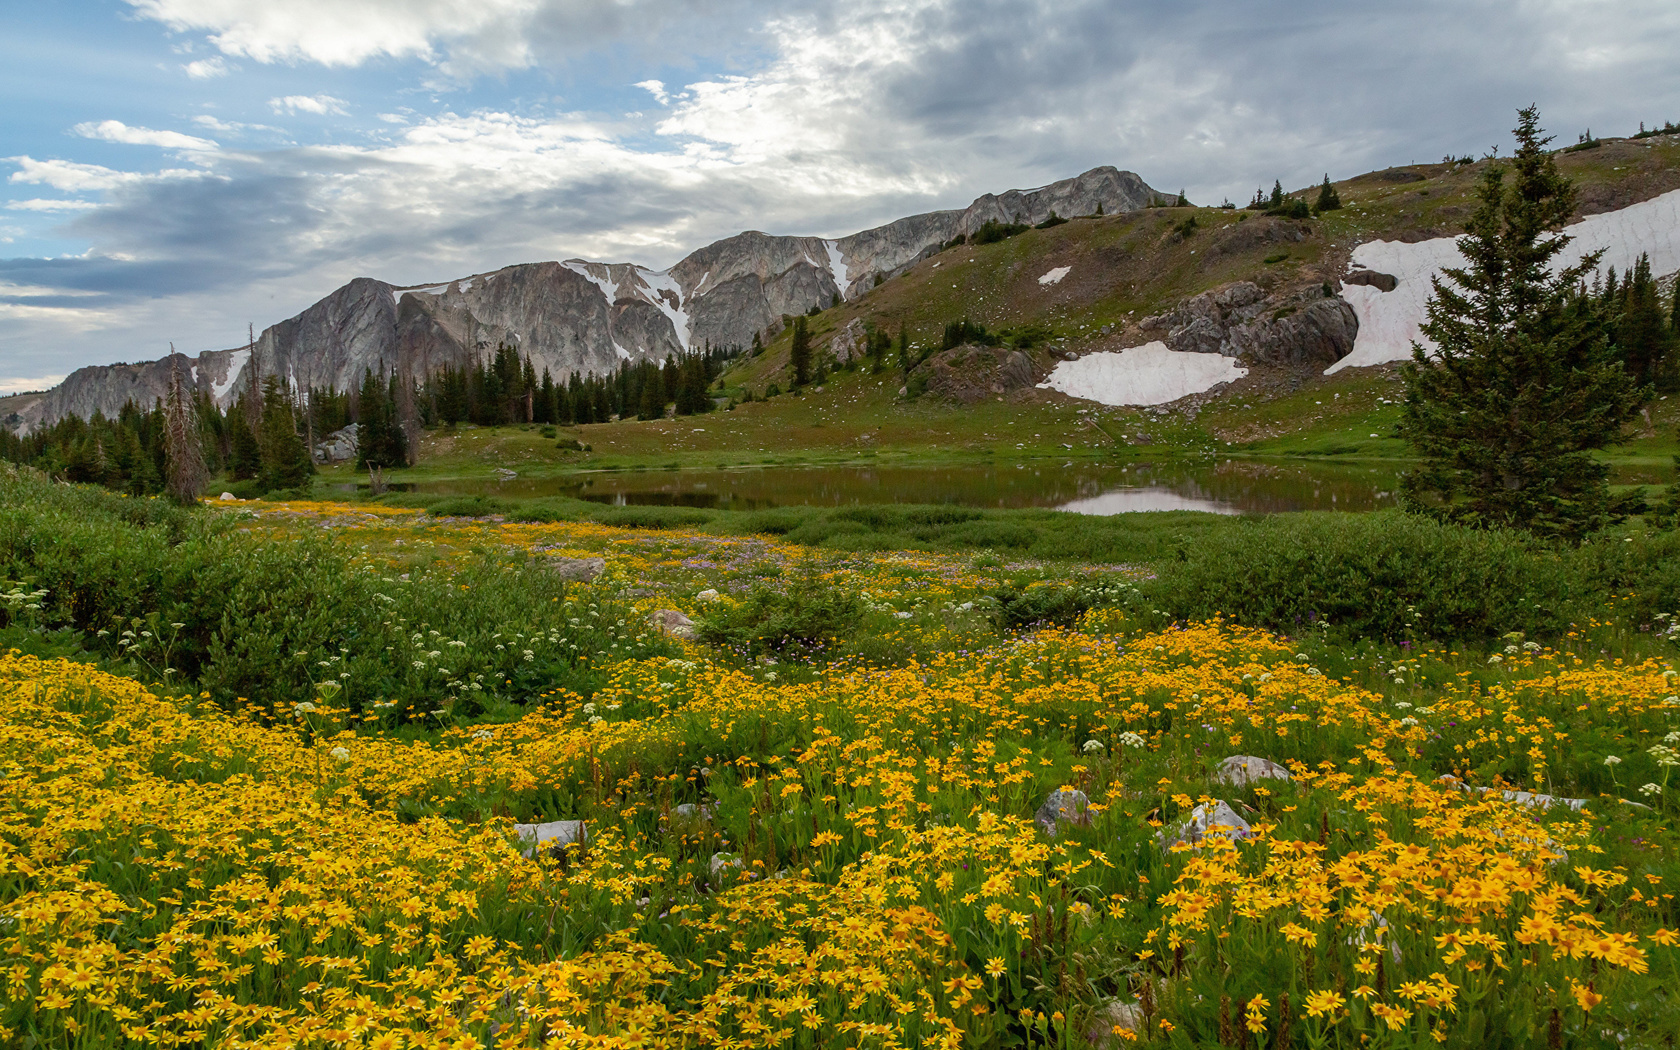 горы, луг, medicine, bow-routt, national, forests, облака, природа